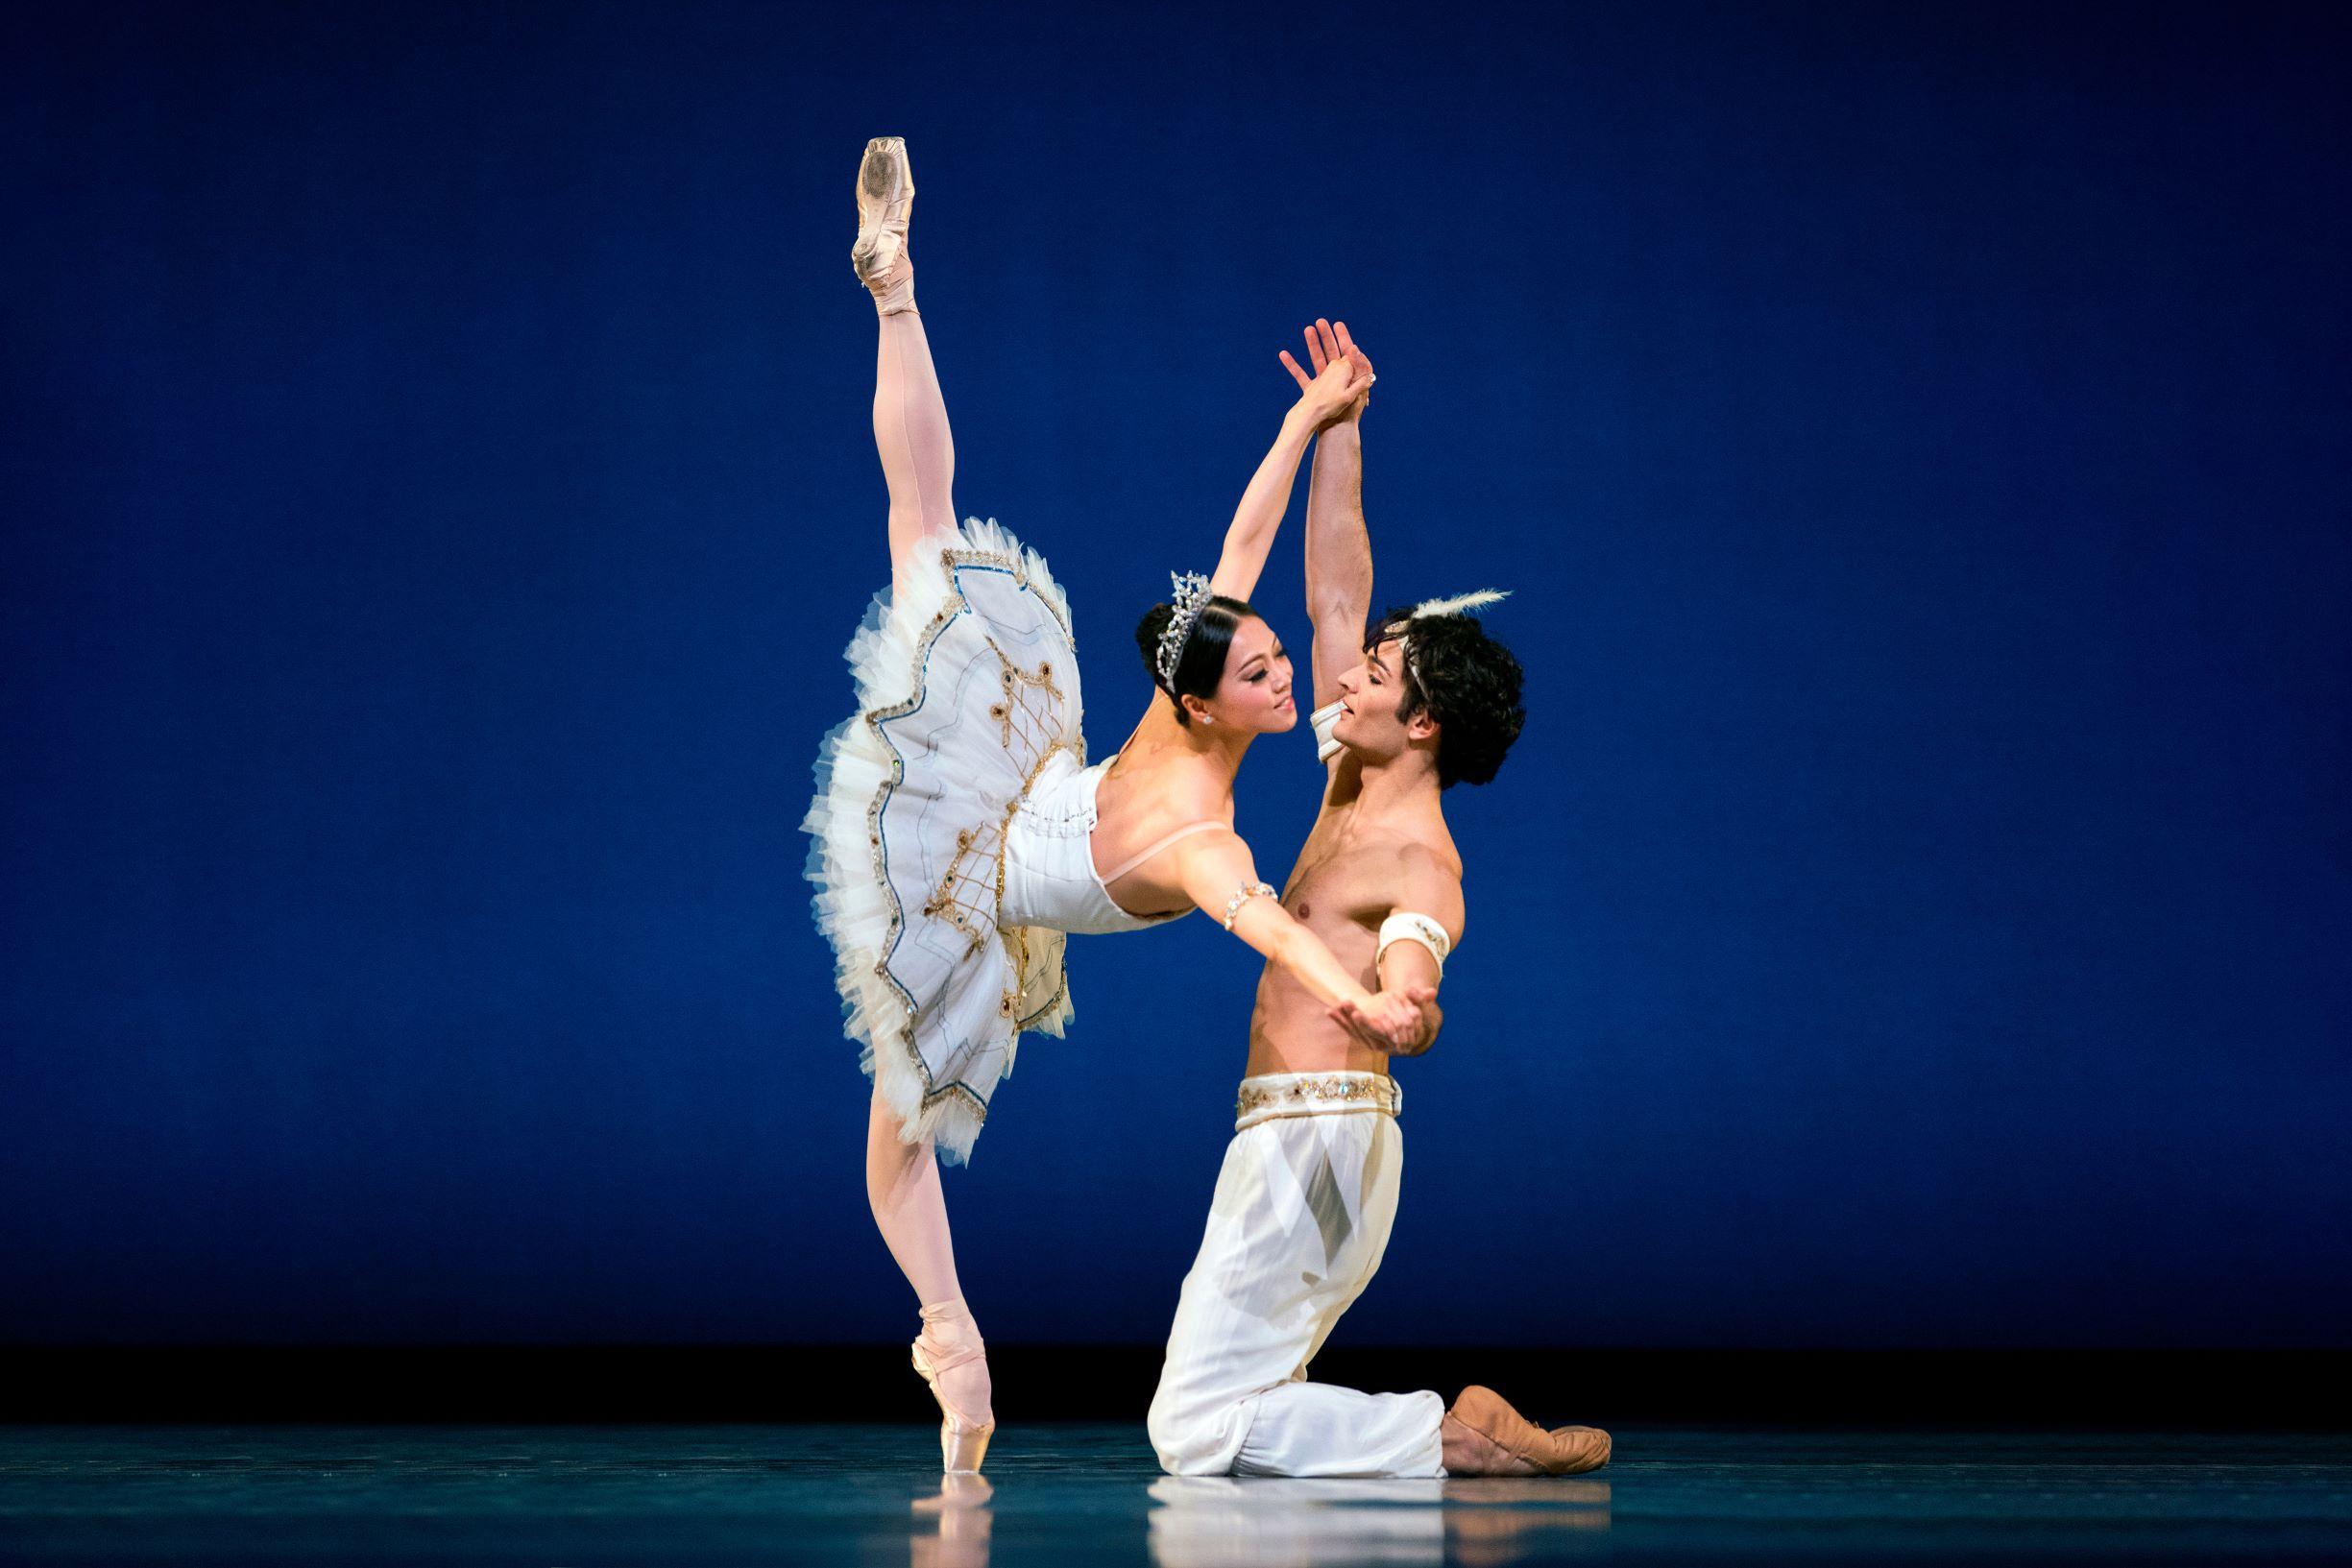 Solodansere fra San Francisco Ballet inviterer på en virtuos rejse gennem ballettens historie på dansefestivalen København Danser